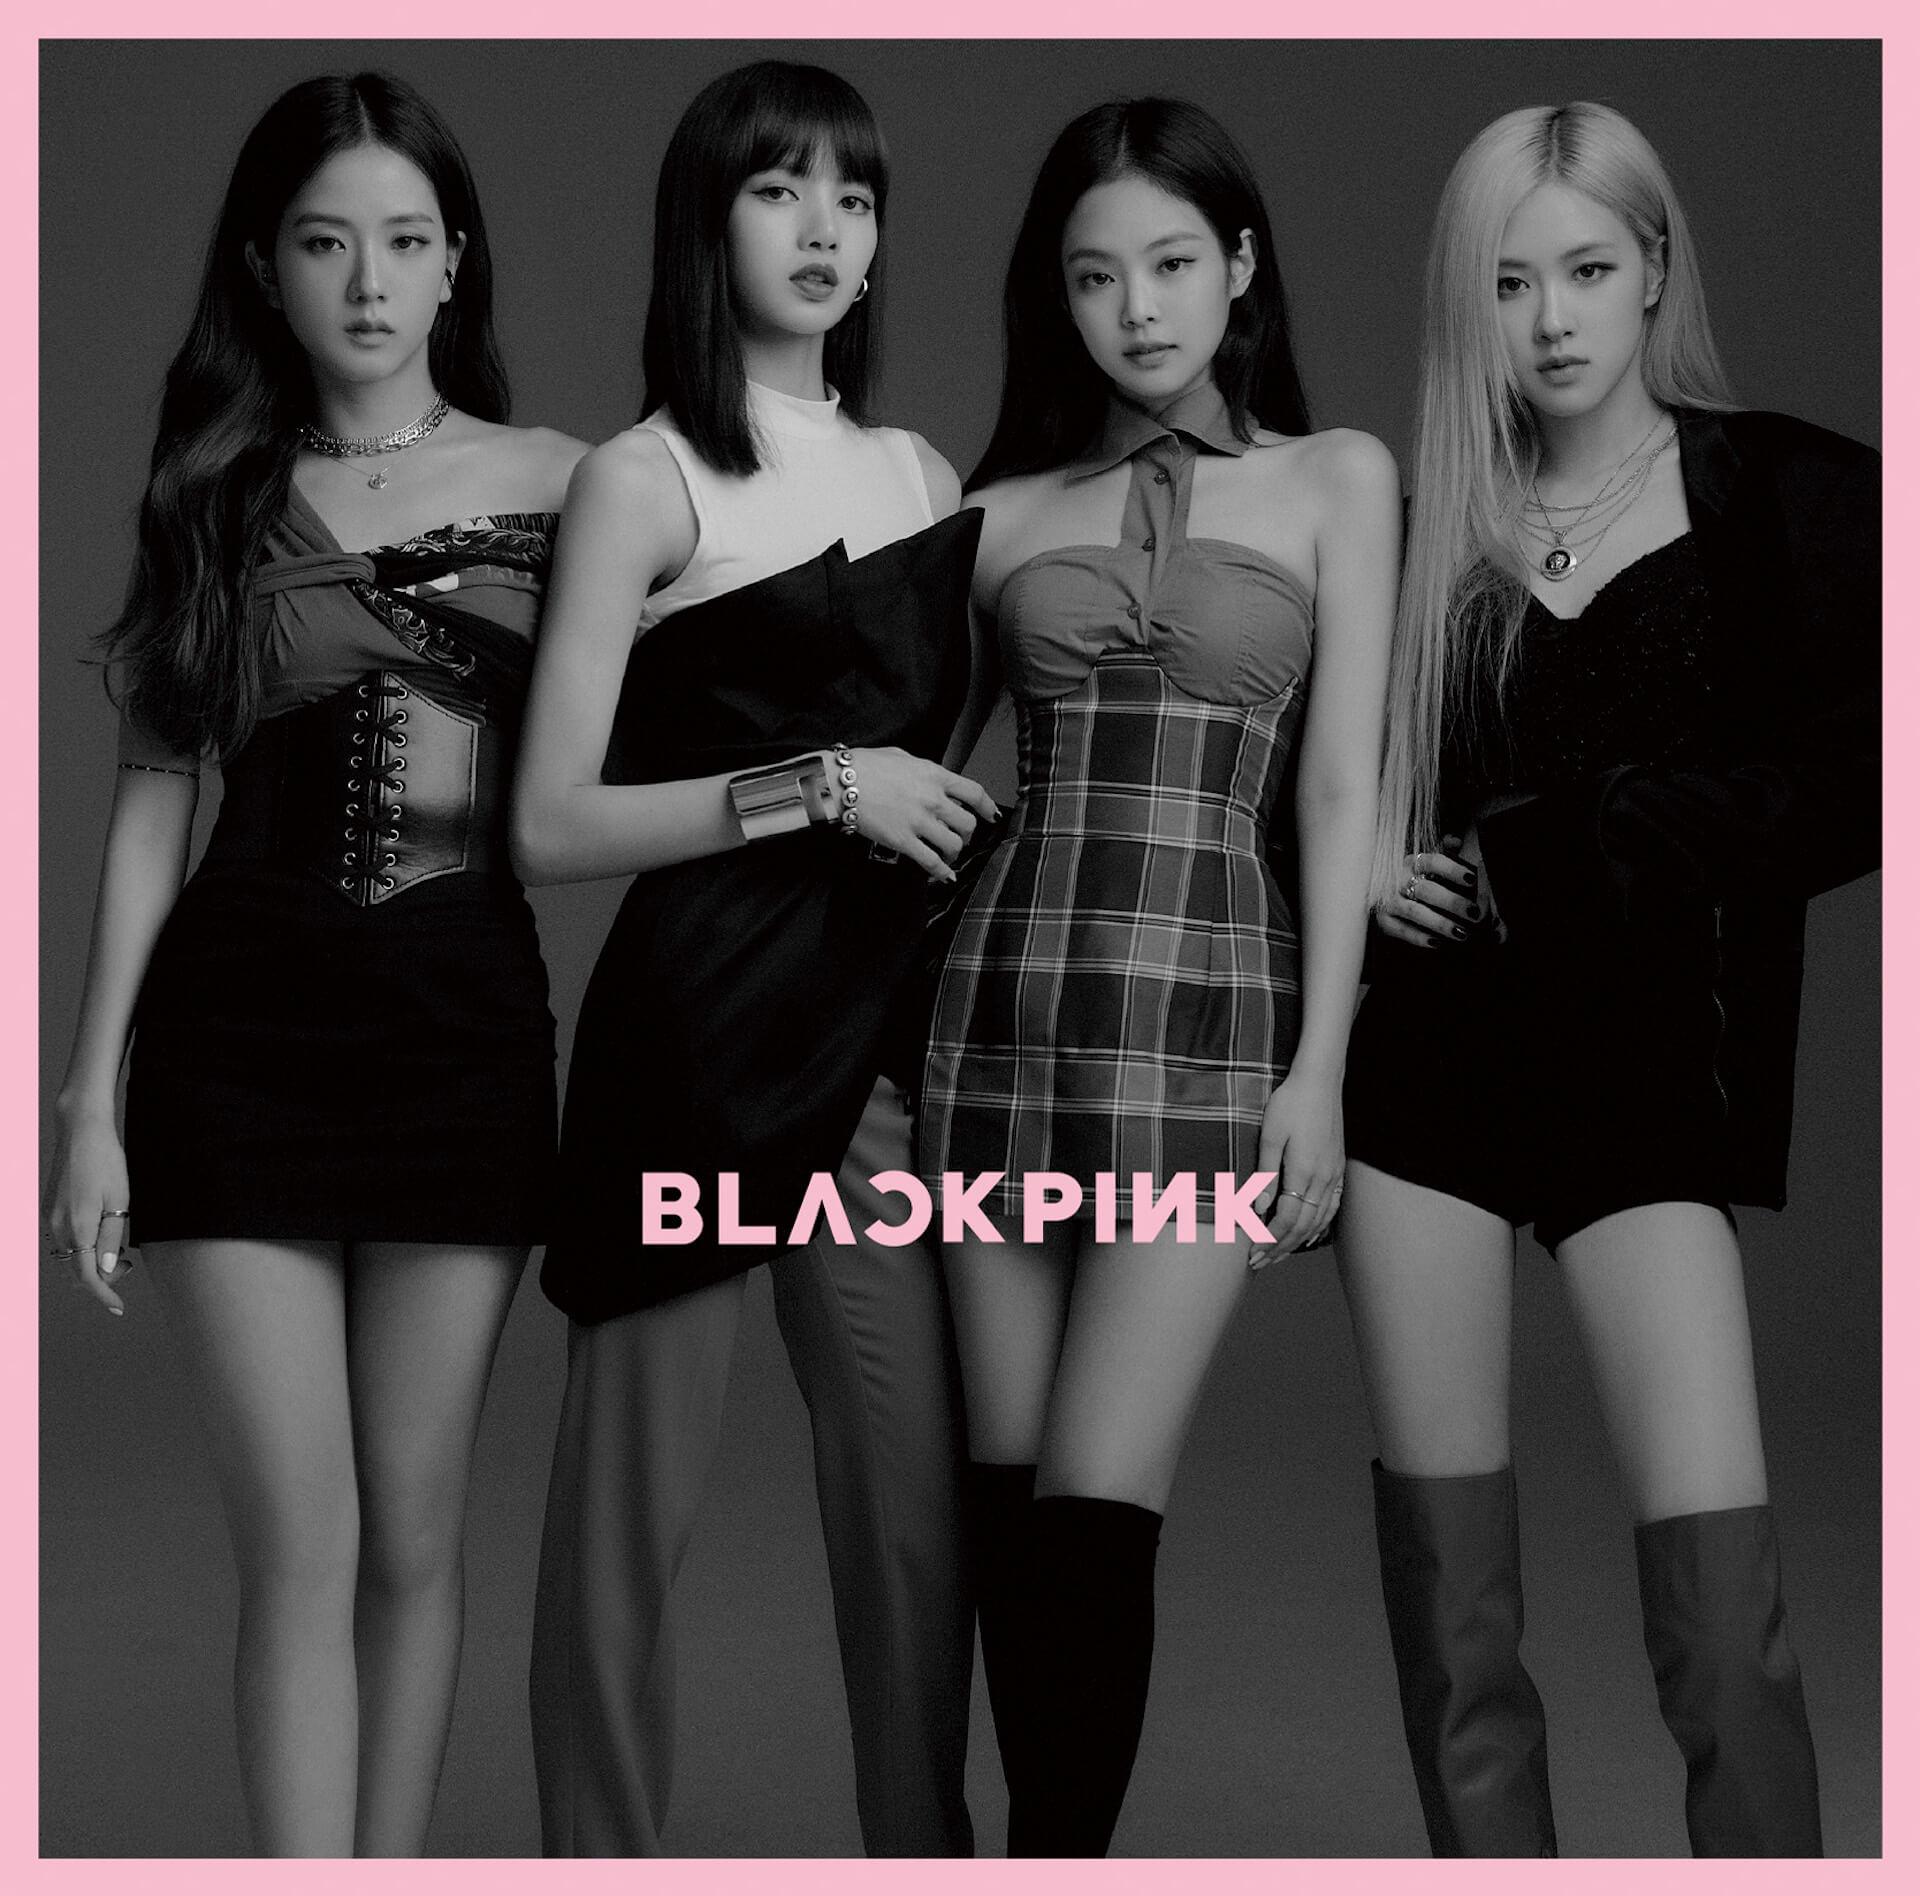 BLACKPINK「Kill This Love」MV6億再生を記録!公開から177日、グループ史上最速 music190930_blackpink_5